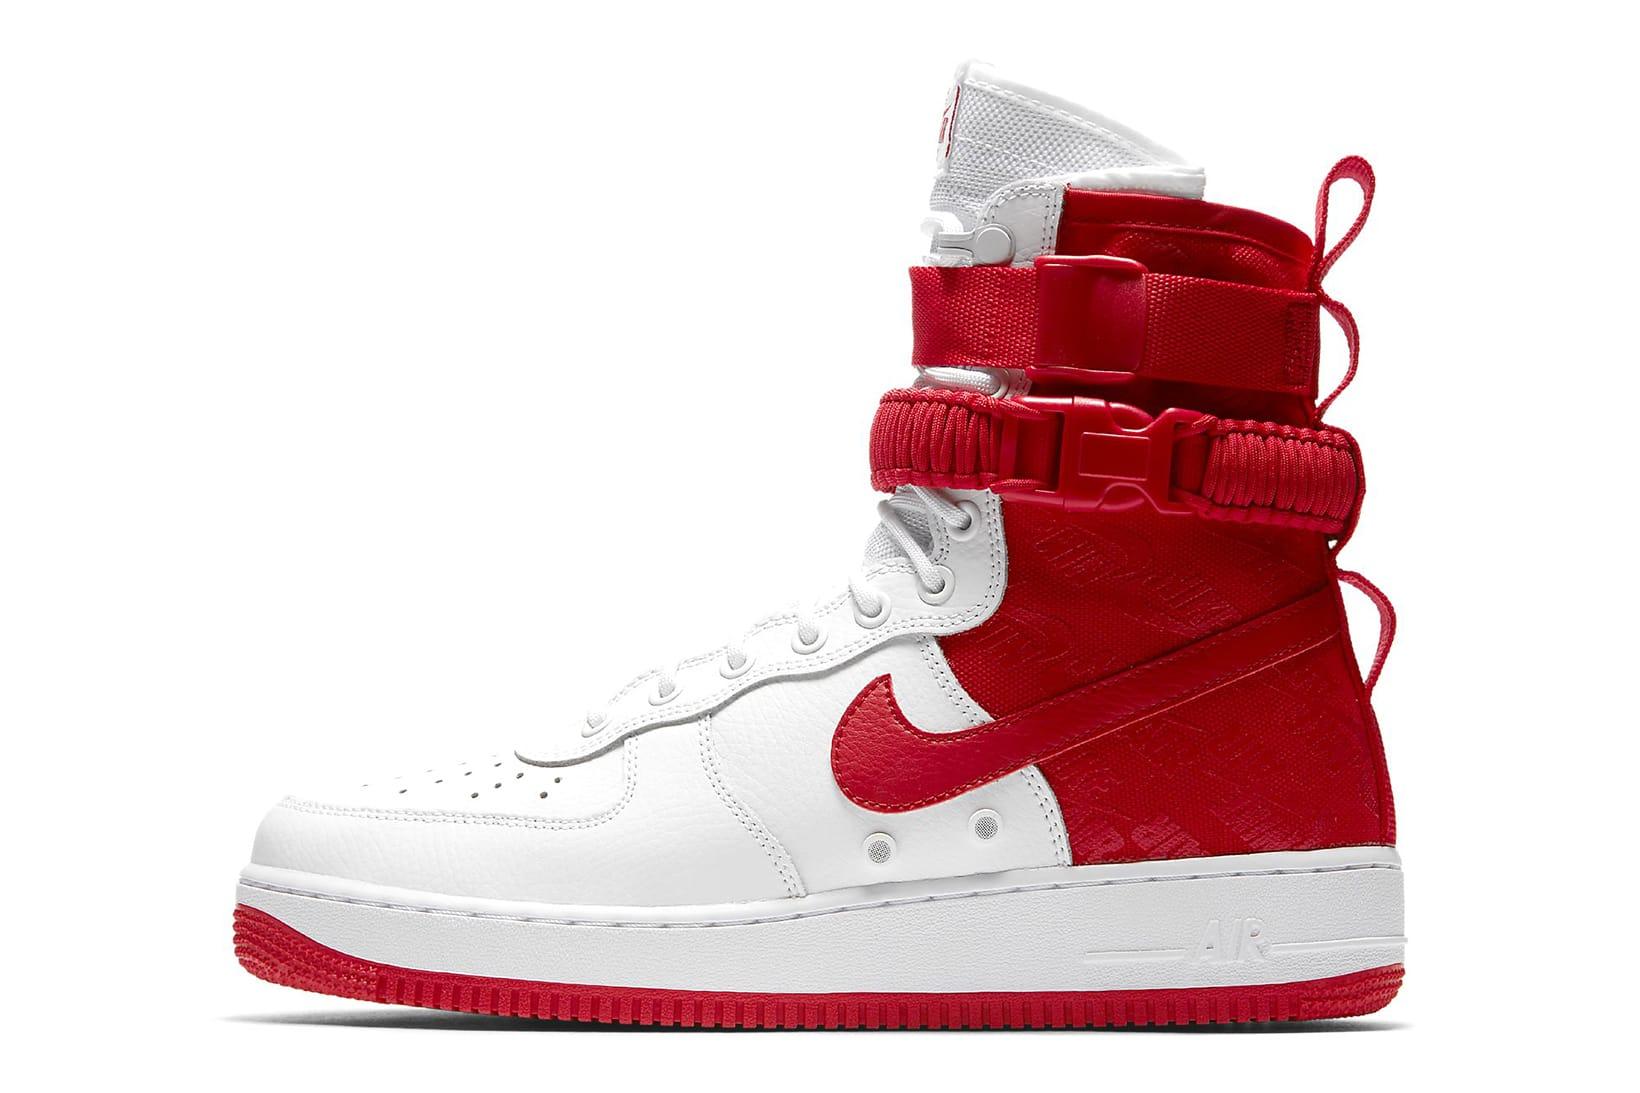 Nike SF-AF1 High White/University Red